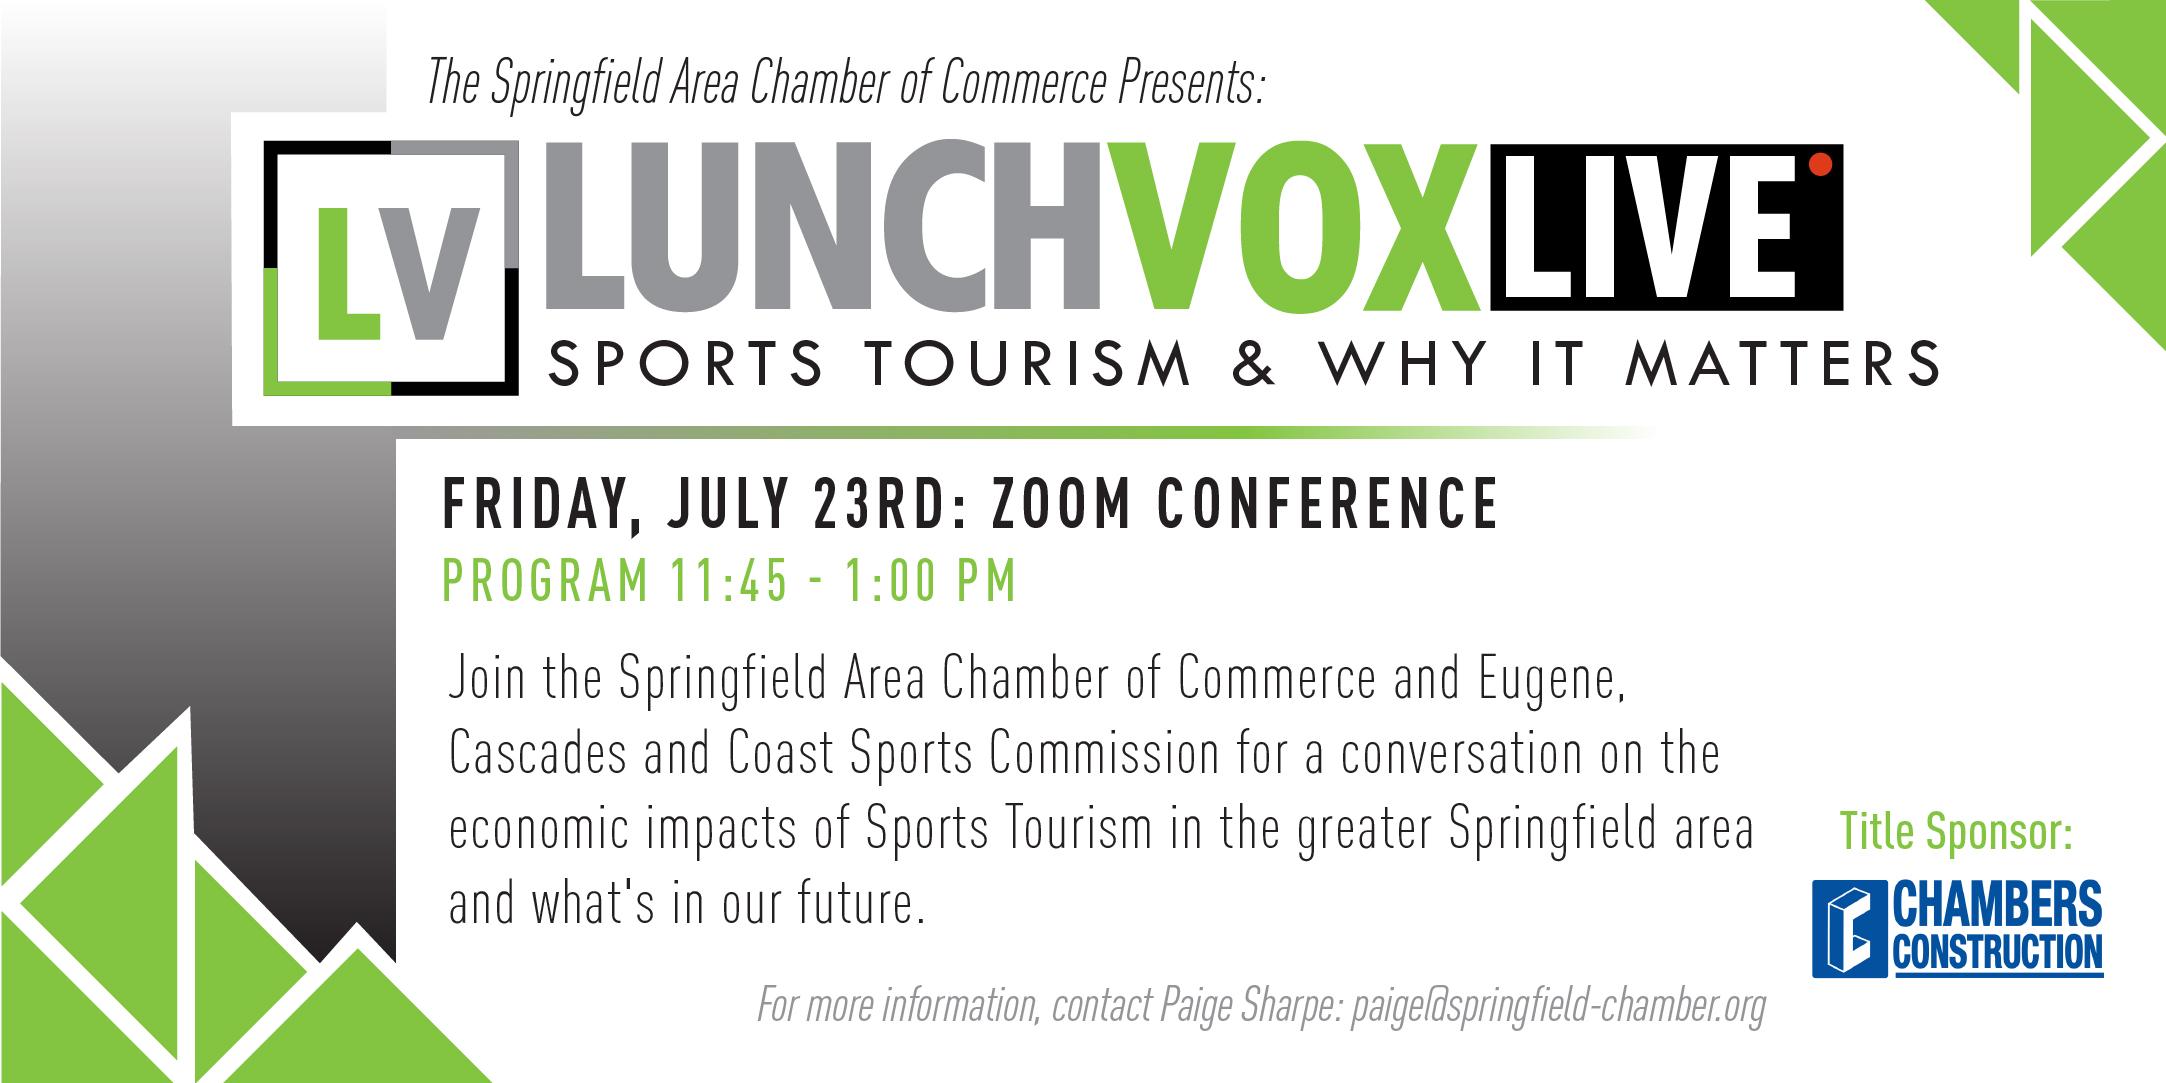 Lunchvox LIVE Sports Tourism